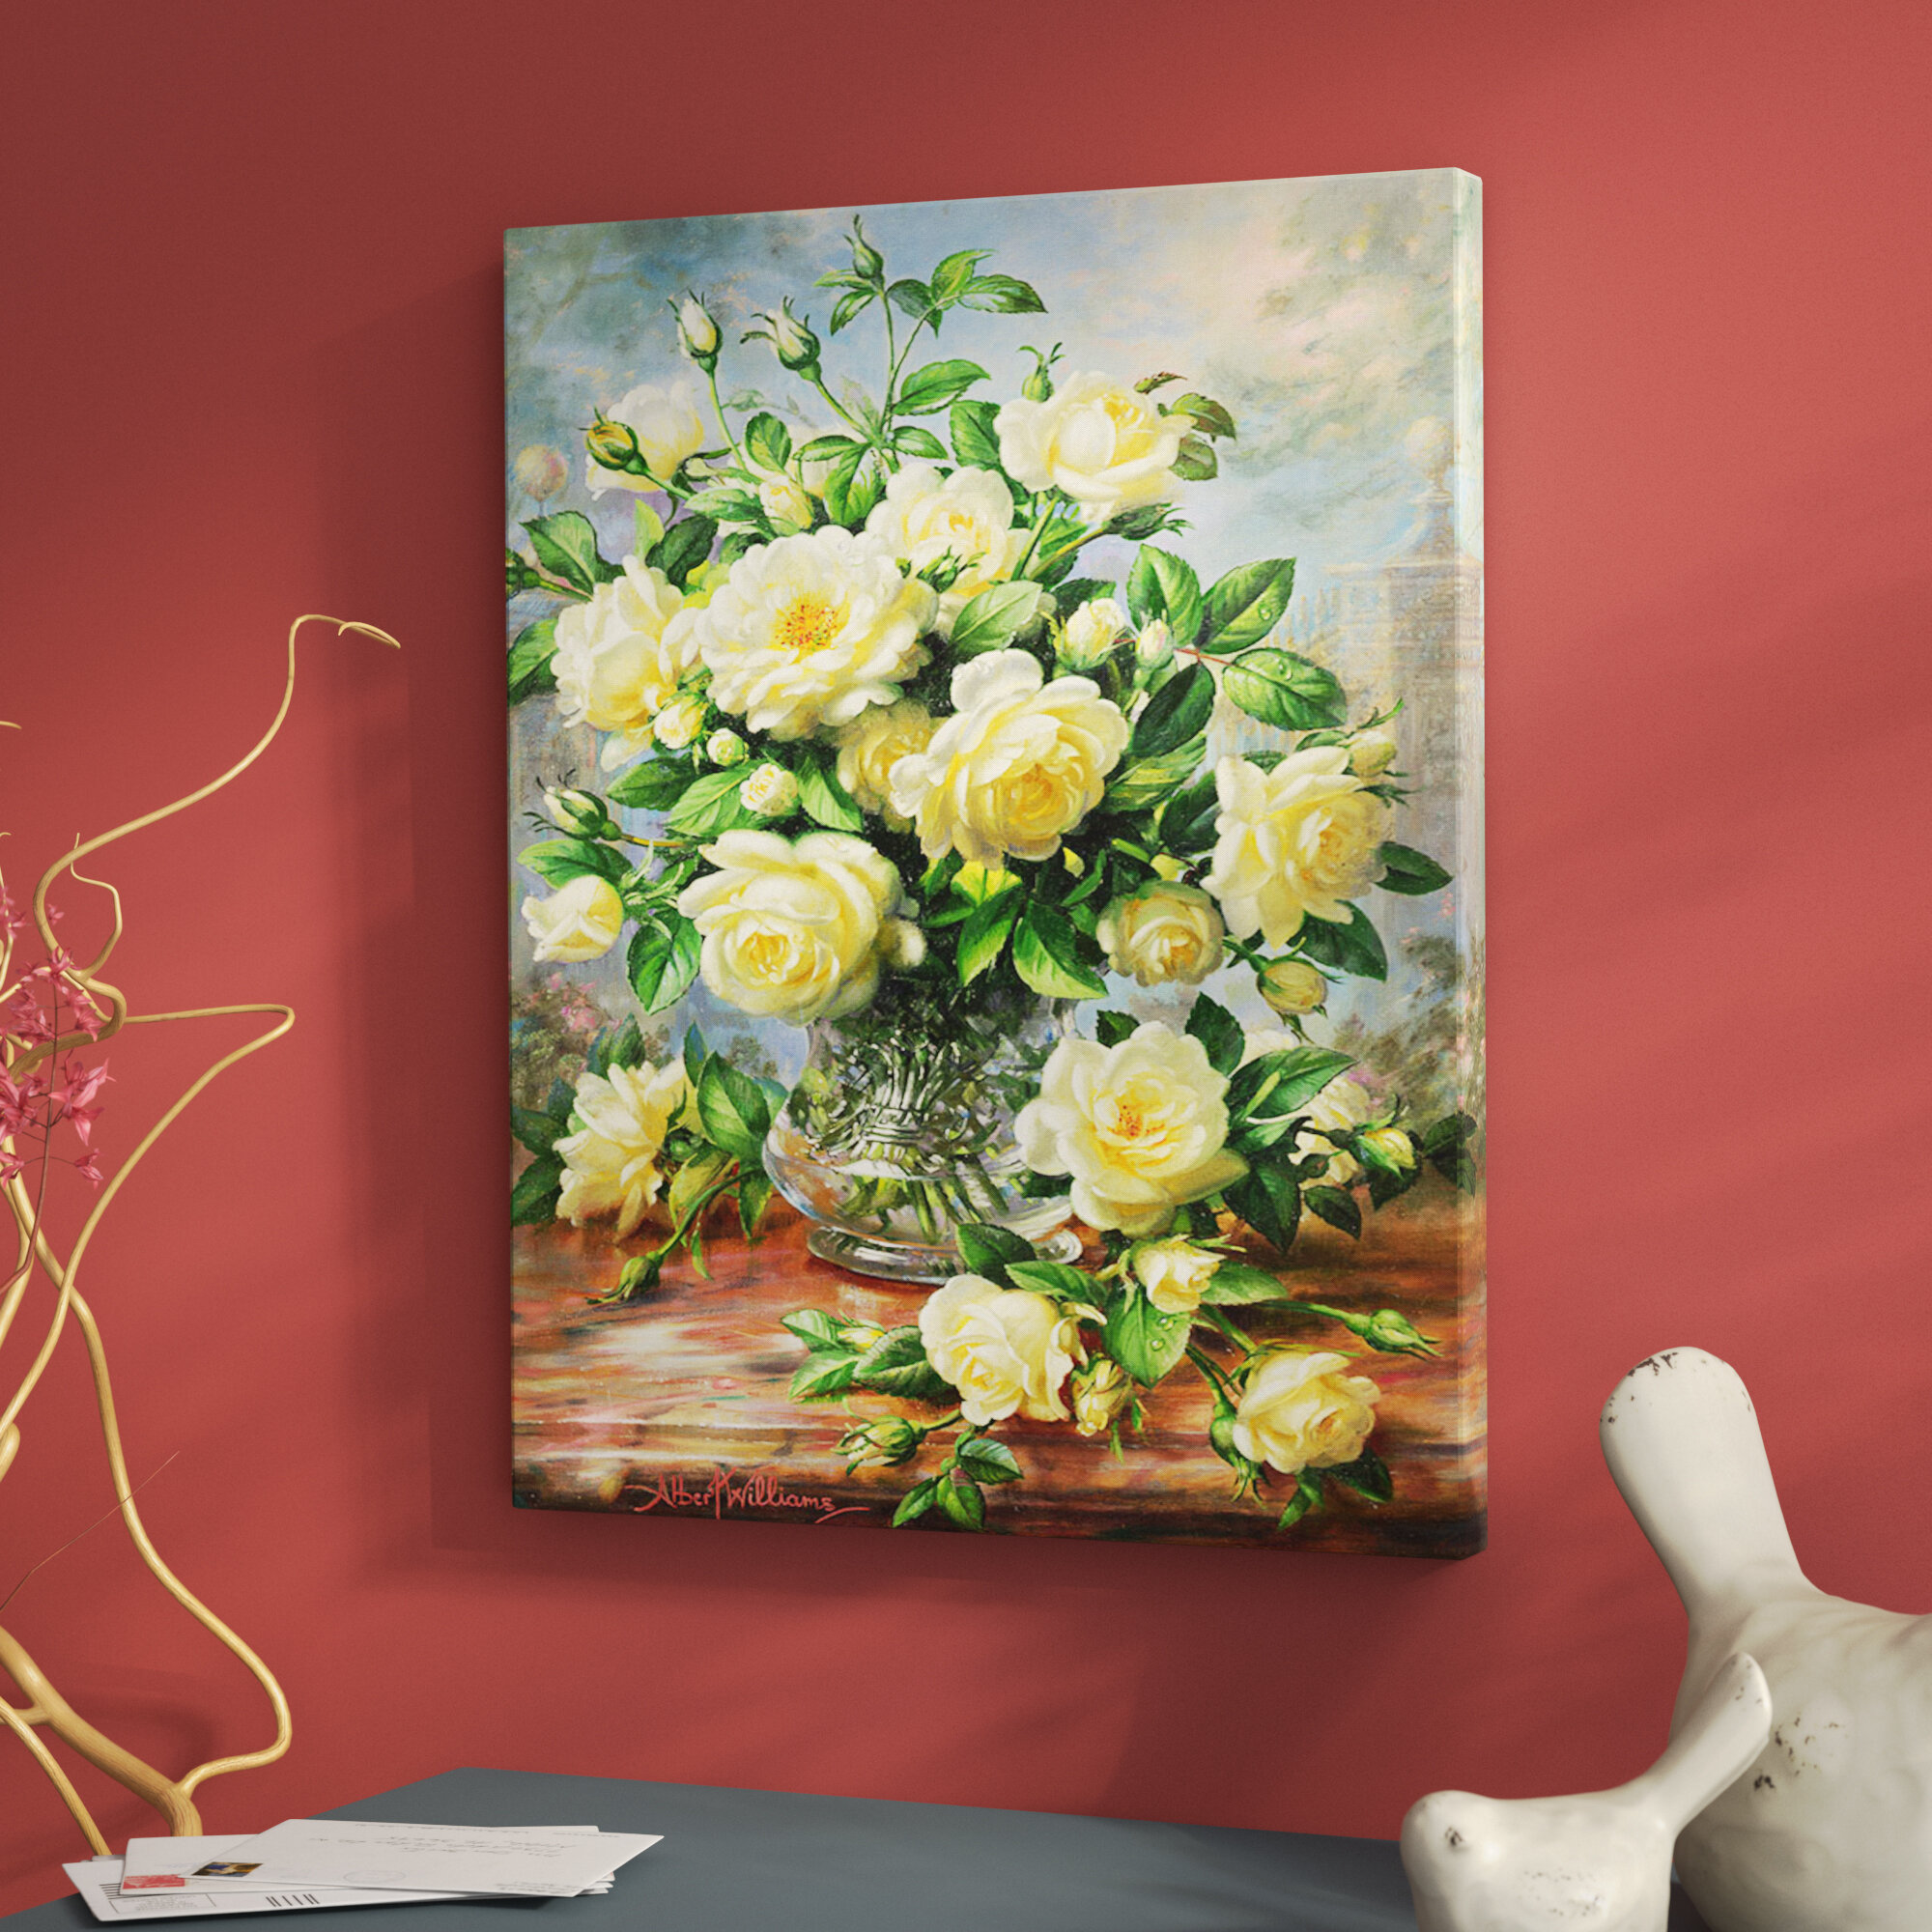 Charlton home princess diana roses in a cut glass vase painting charlton home princess diana roses in a cut glass vase painting print on canvas reviews wayfair reviewsmspy